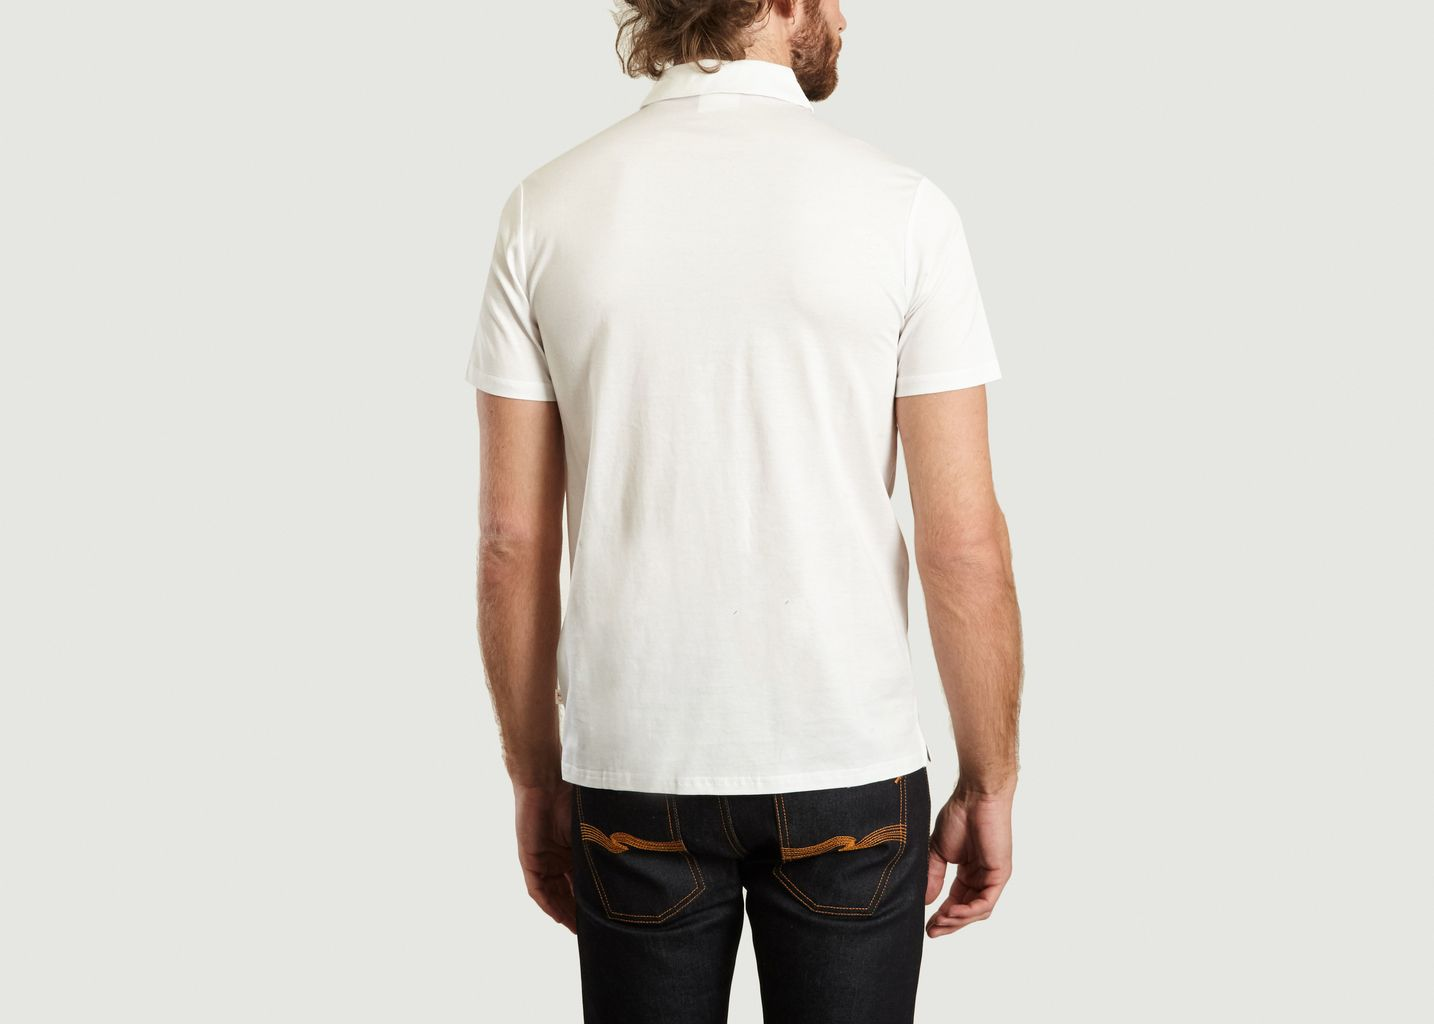 Polo Mercerized - Knowledge Cotton Apparel